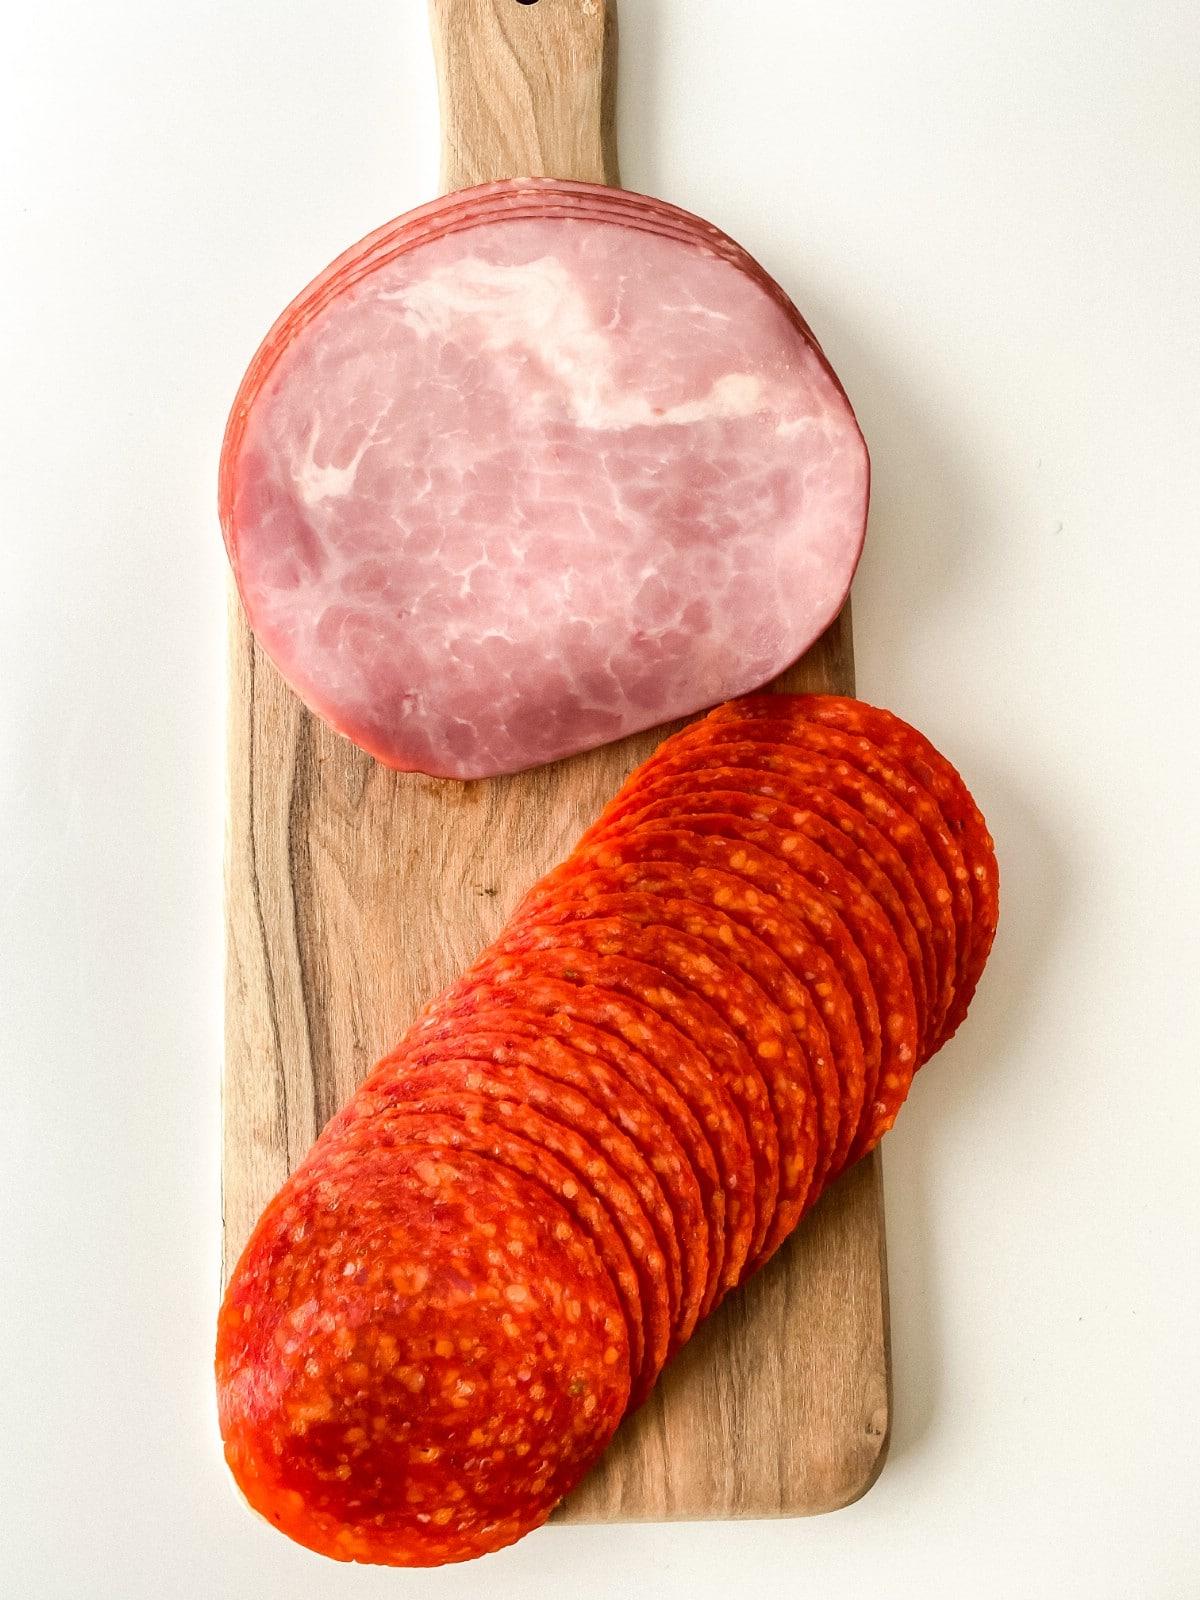 Sliced ham and sliced pepperoni on cutting board